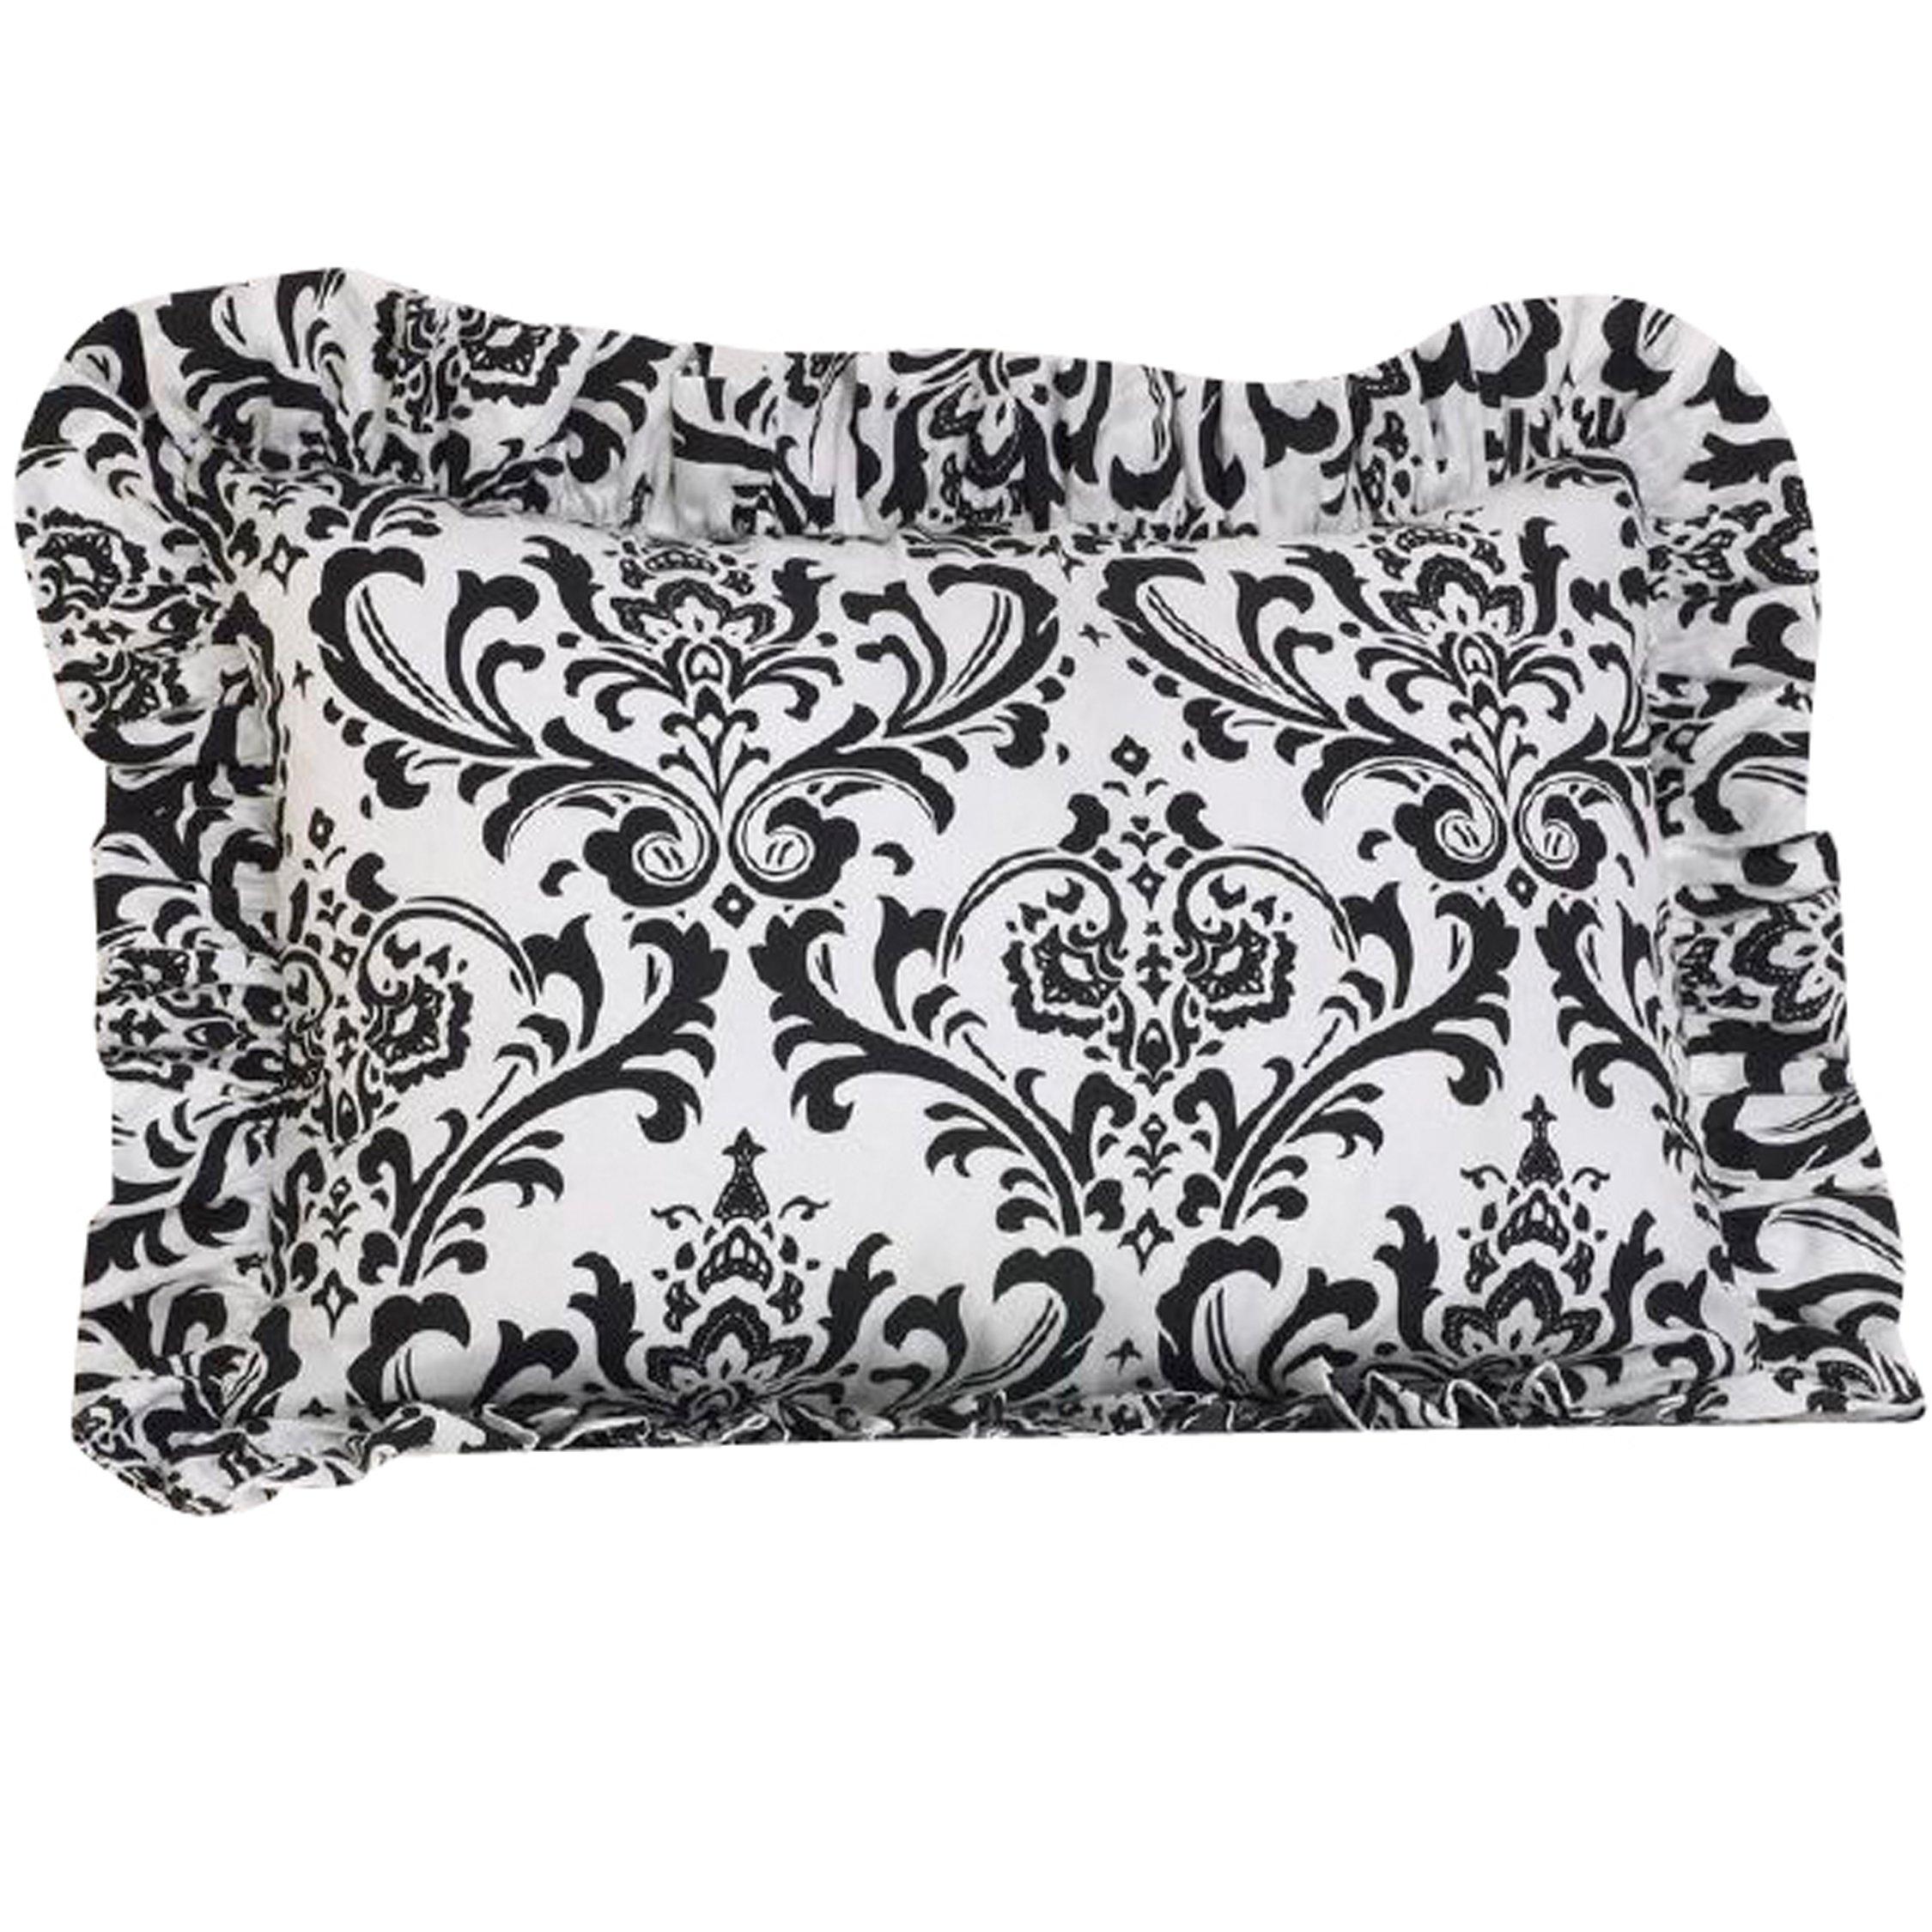 Cotton Tale Designs 100% Cotton Black & White Floral Damask Standard Ruffled Pillow Sham - Girl - Pillow Cover